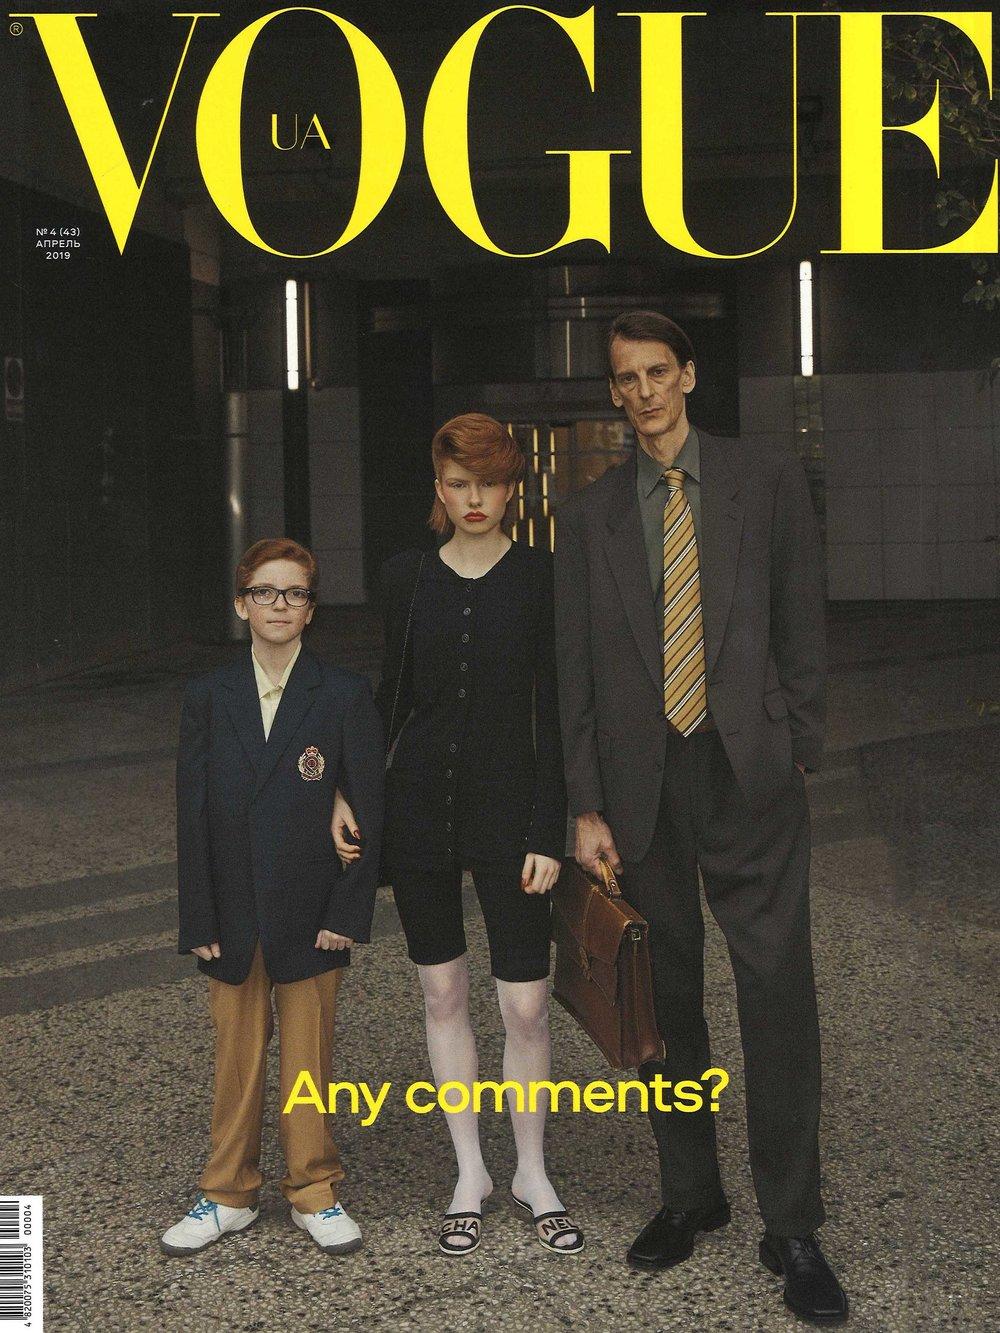 Vogue Ukraine April 2019 Cover.jpg